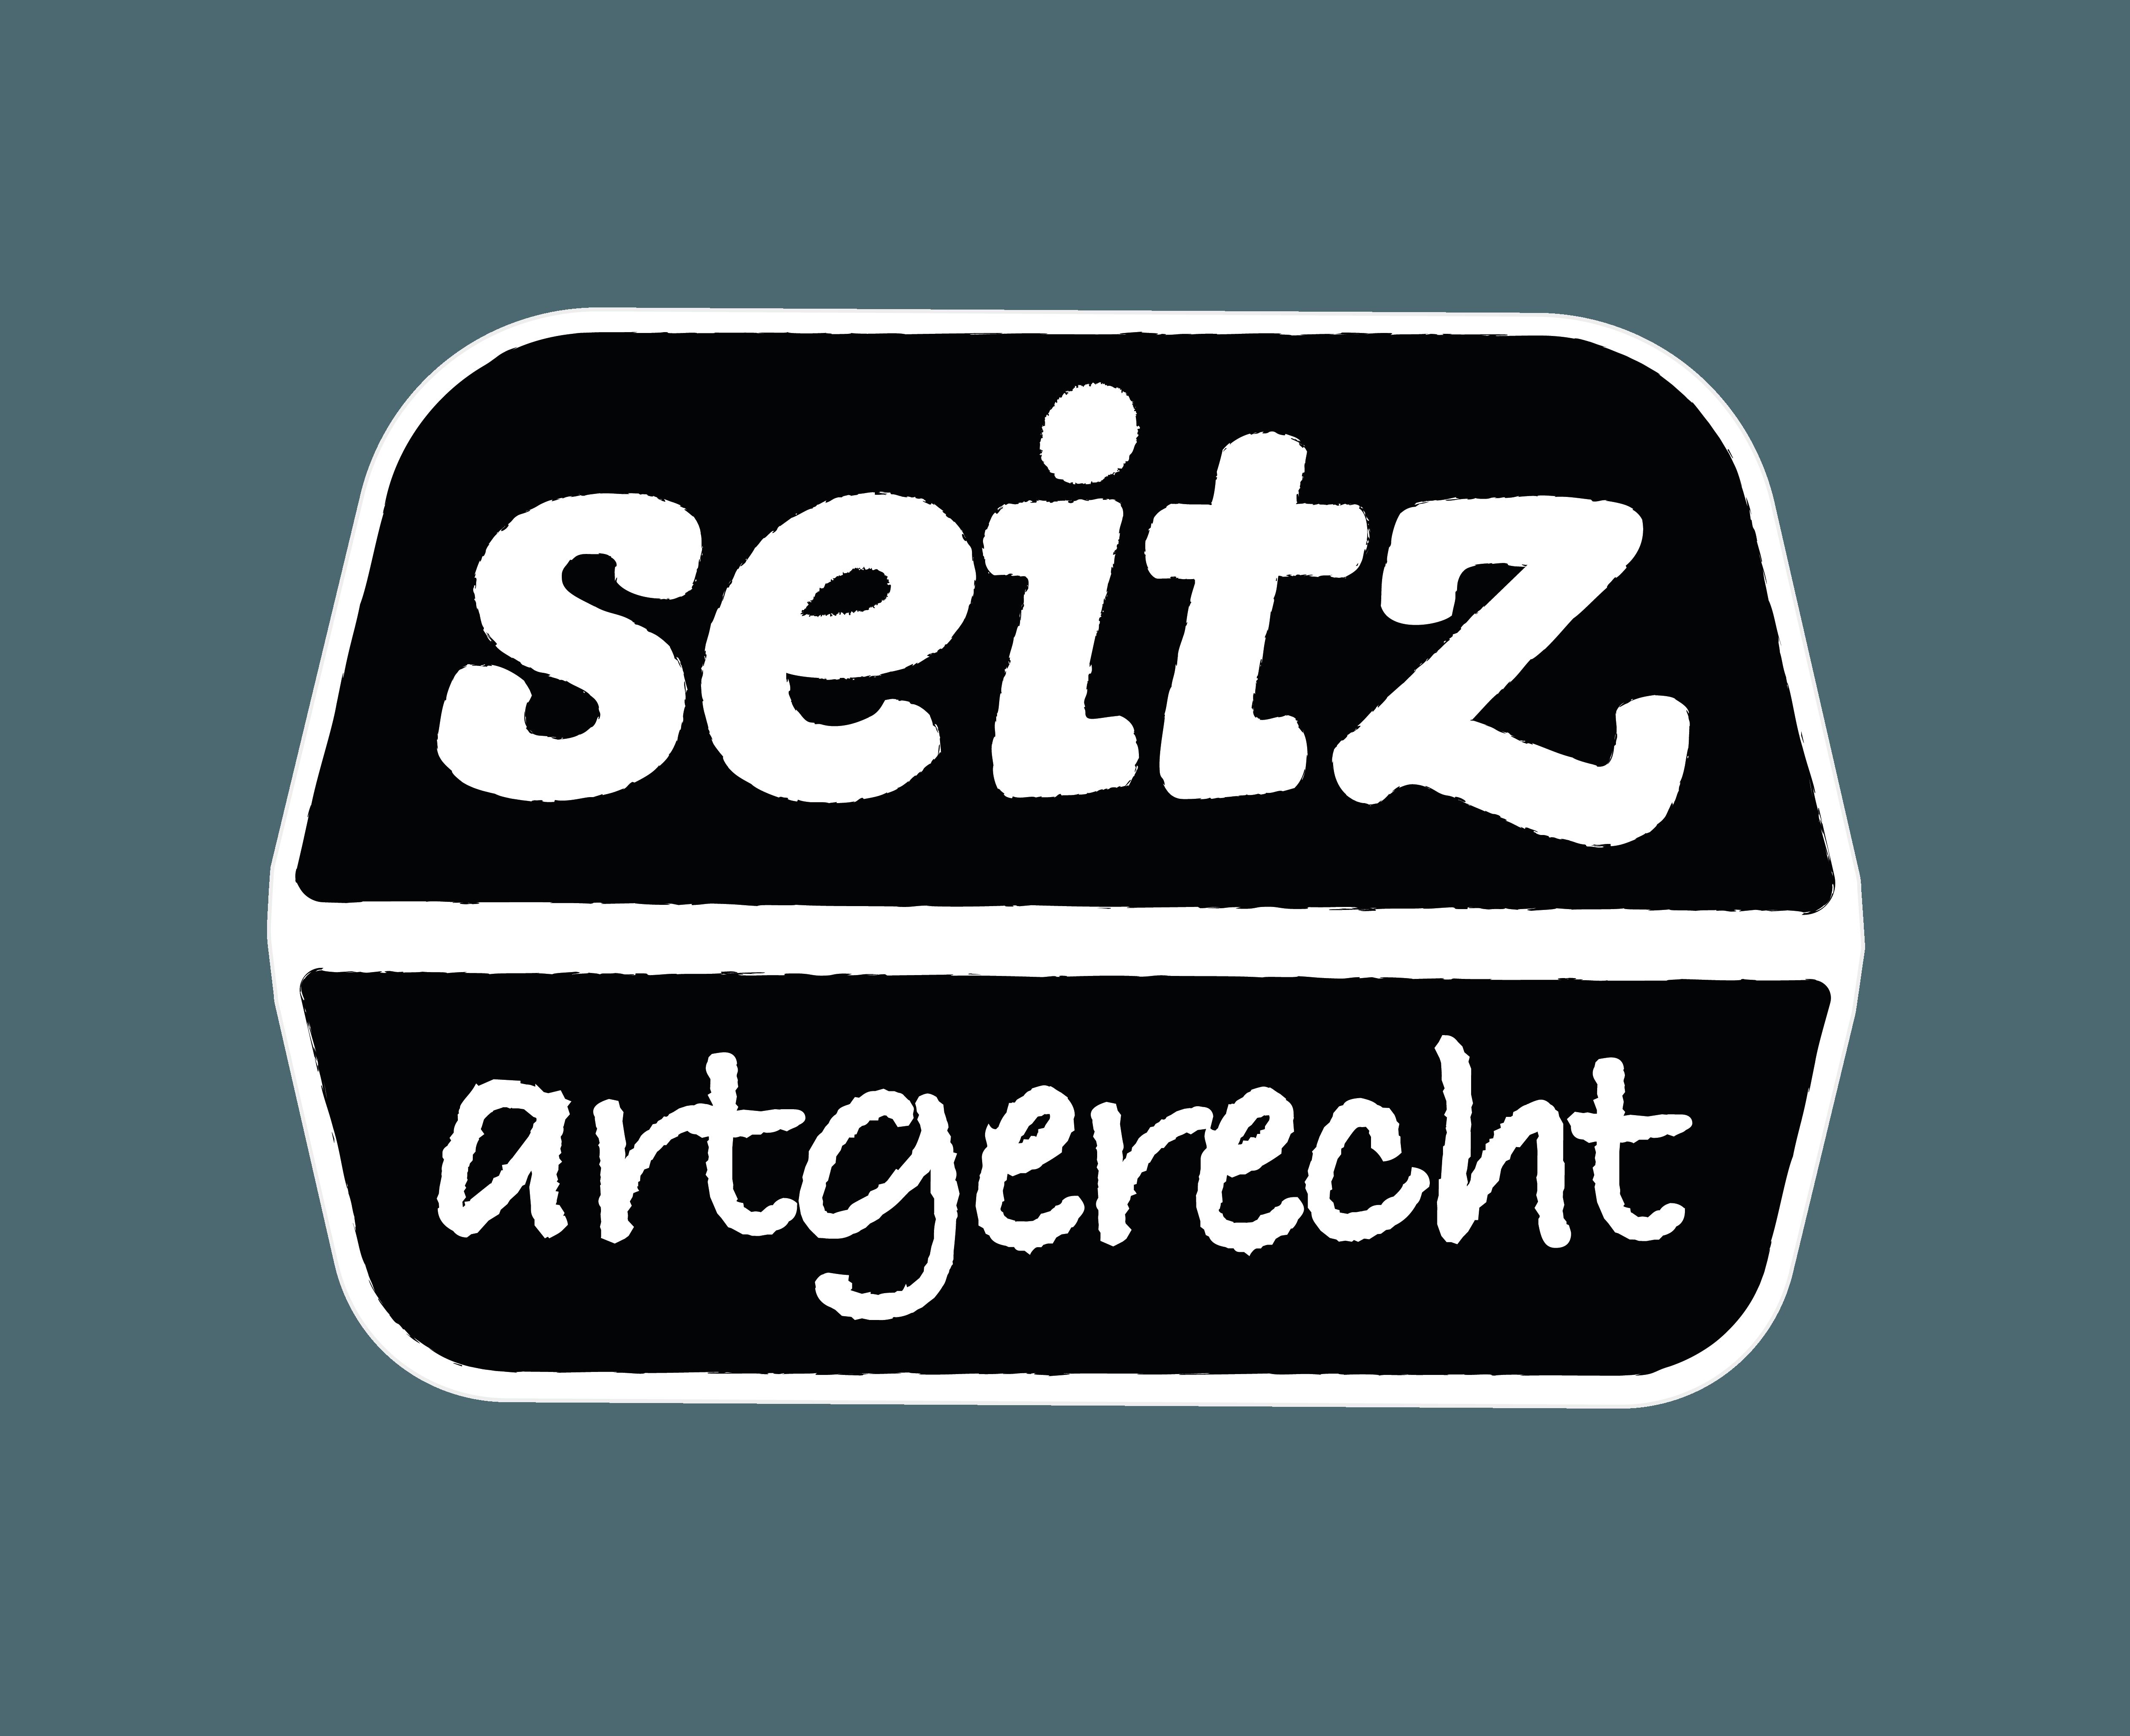 SEITZ_artgerecht_logo